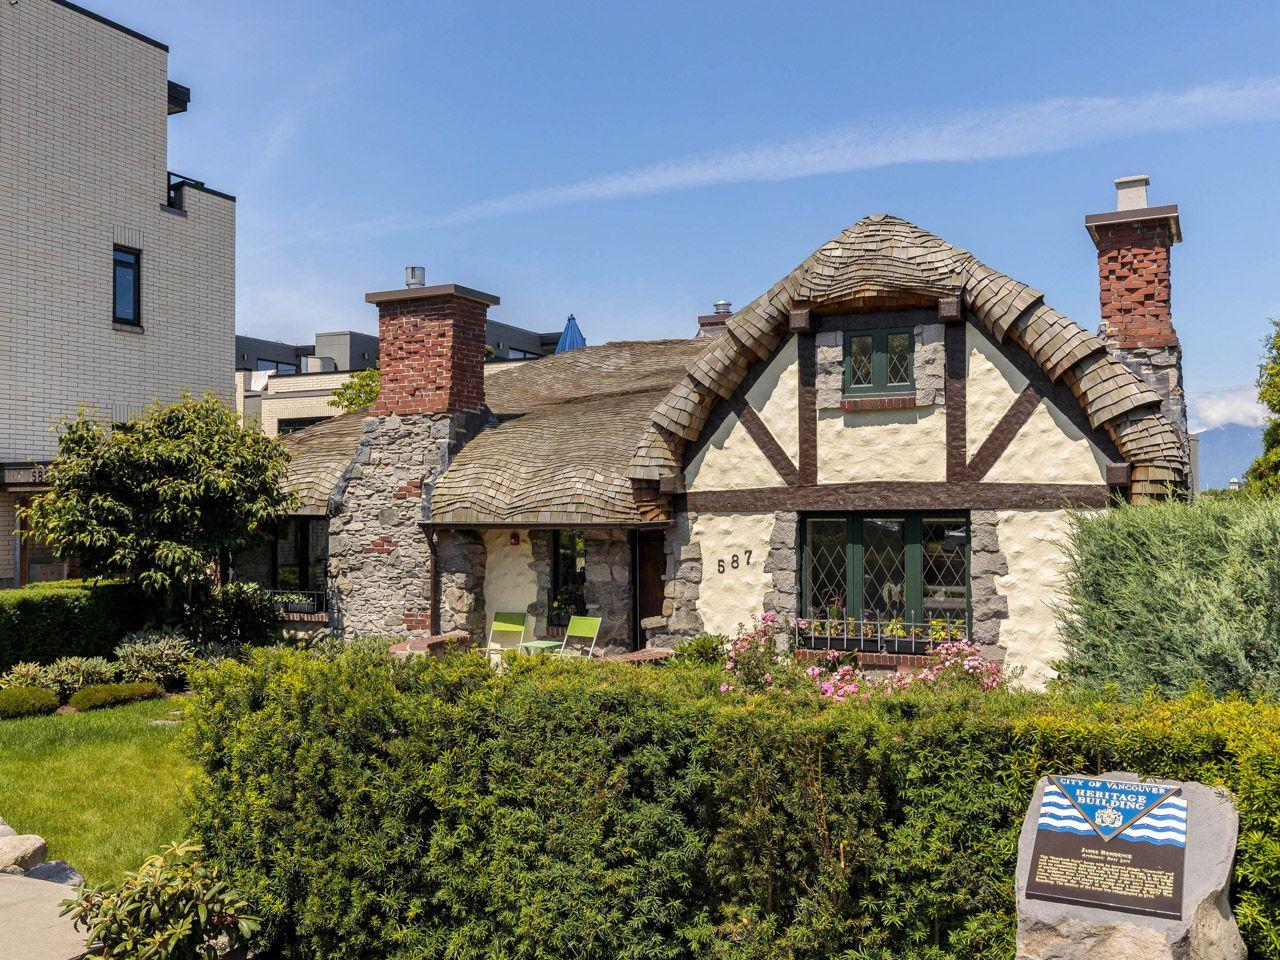 vanouver hobbit house